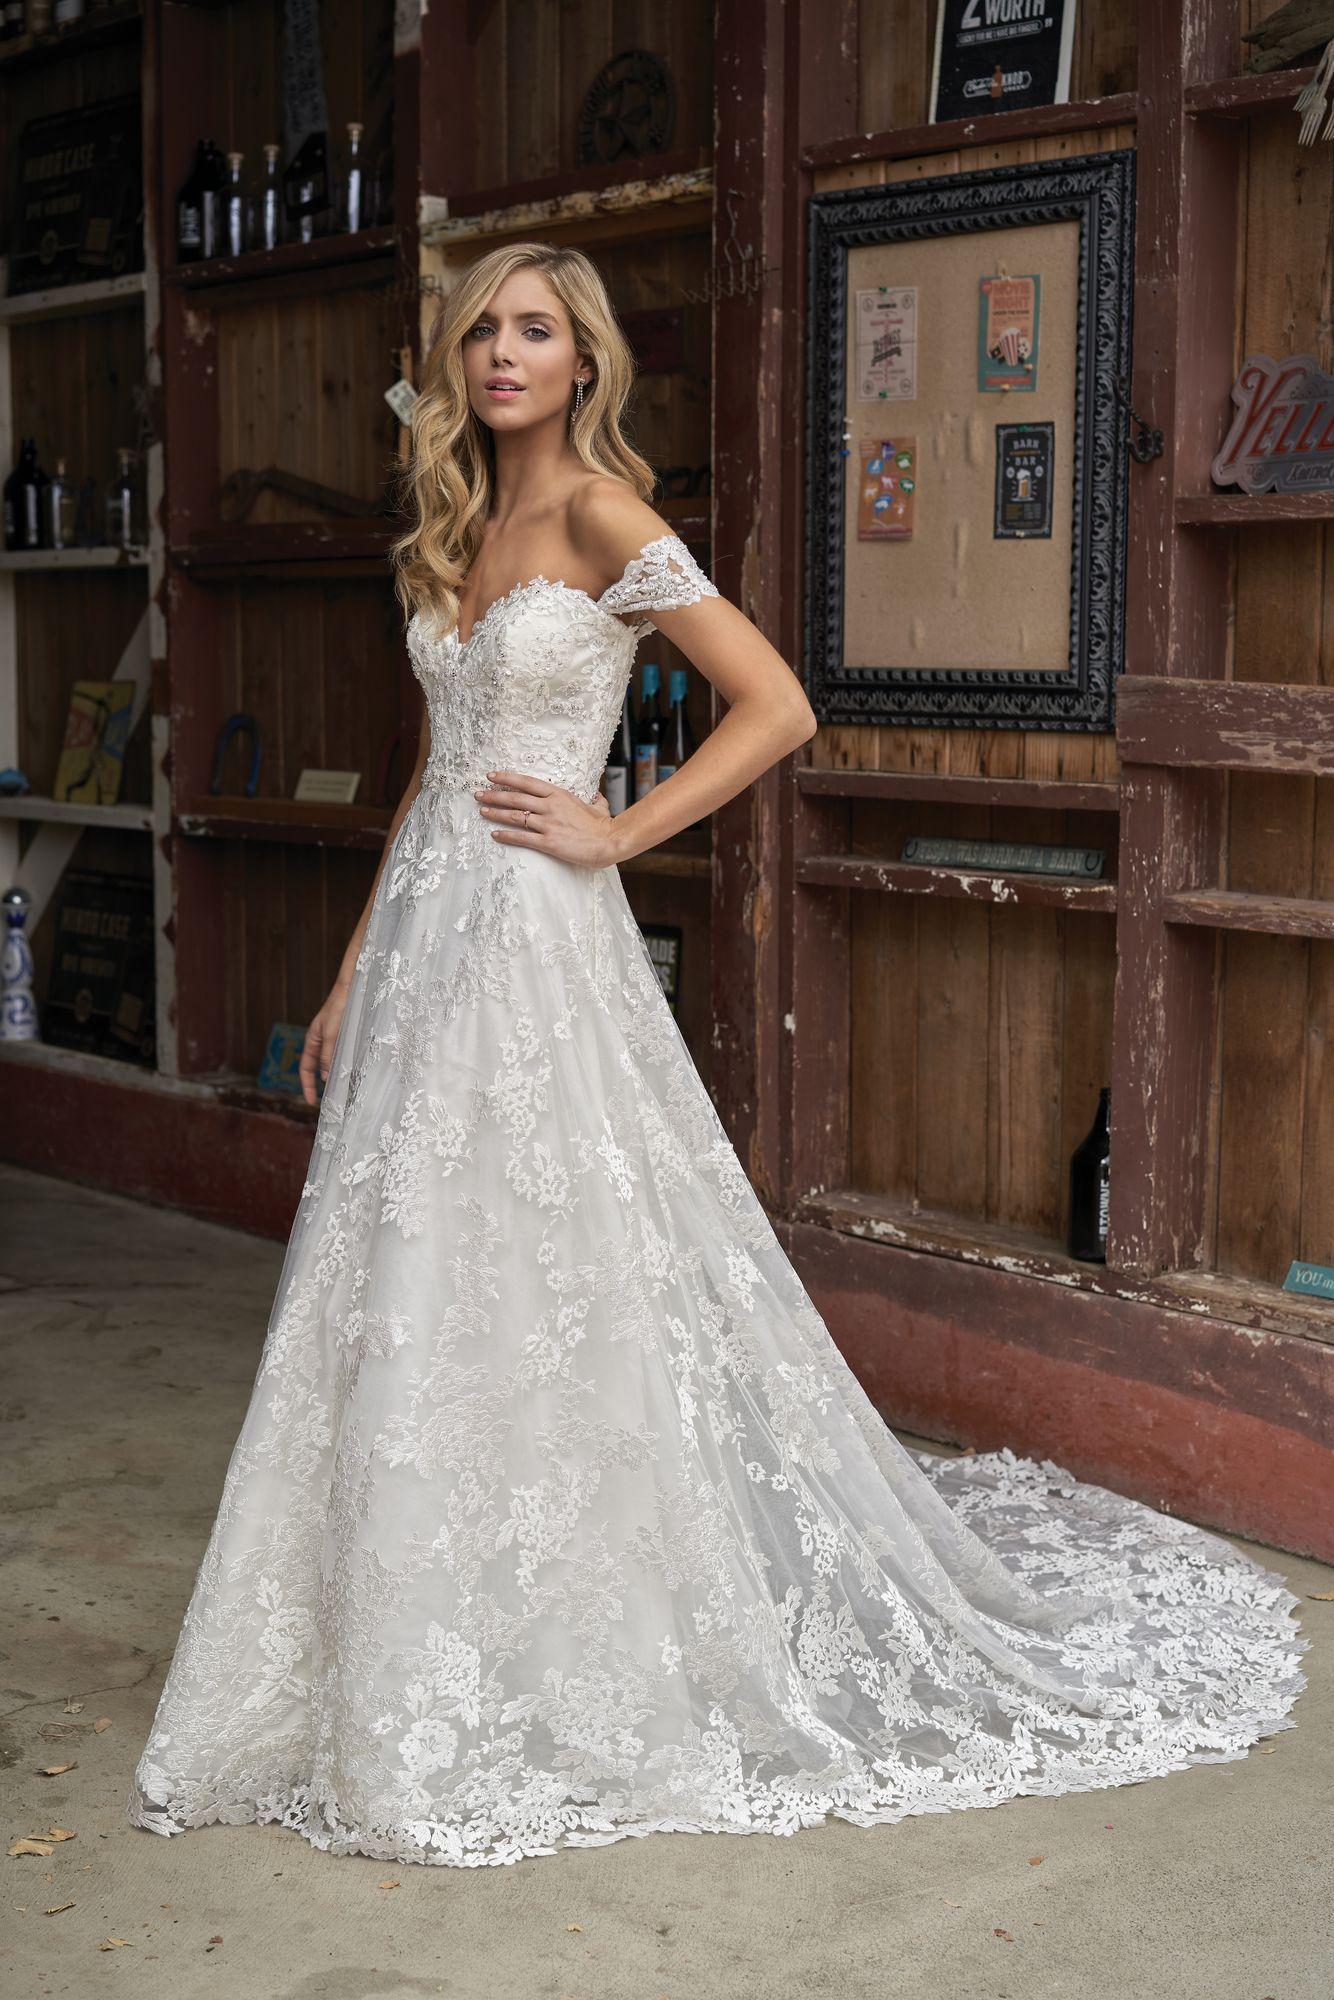 Exclusive wedding dress rom Jacqueline's Bridal near